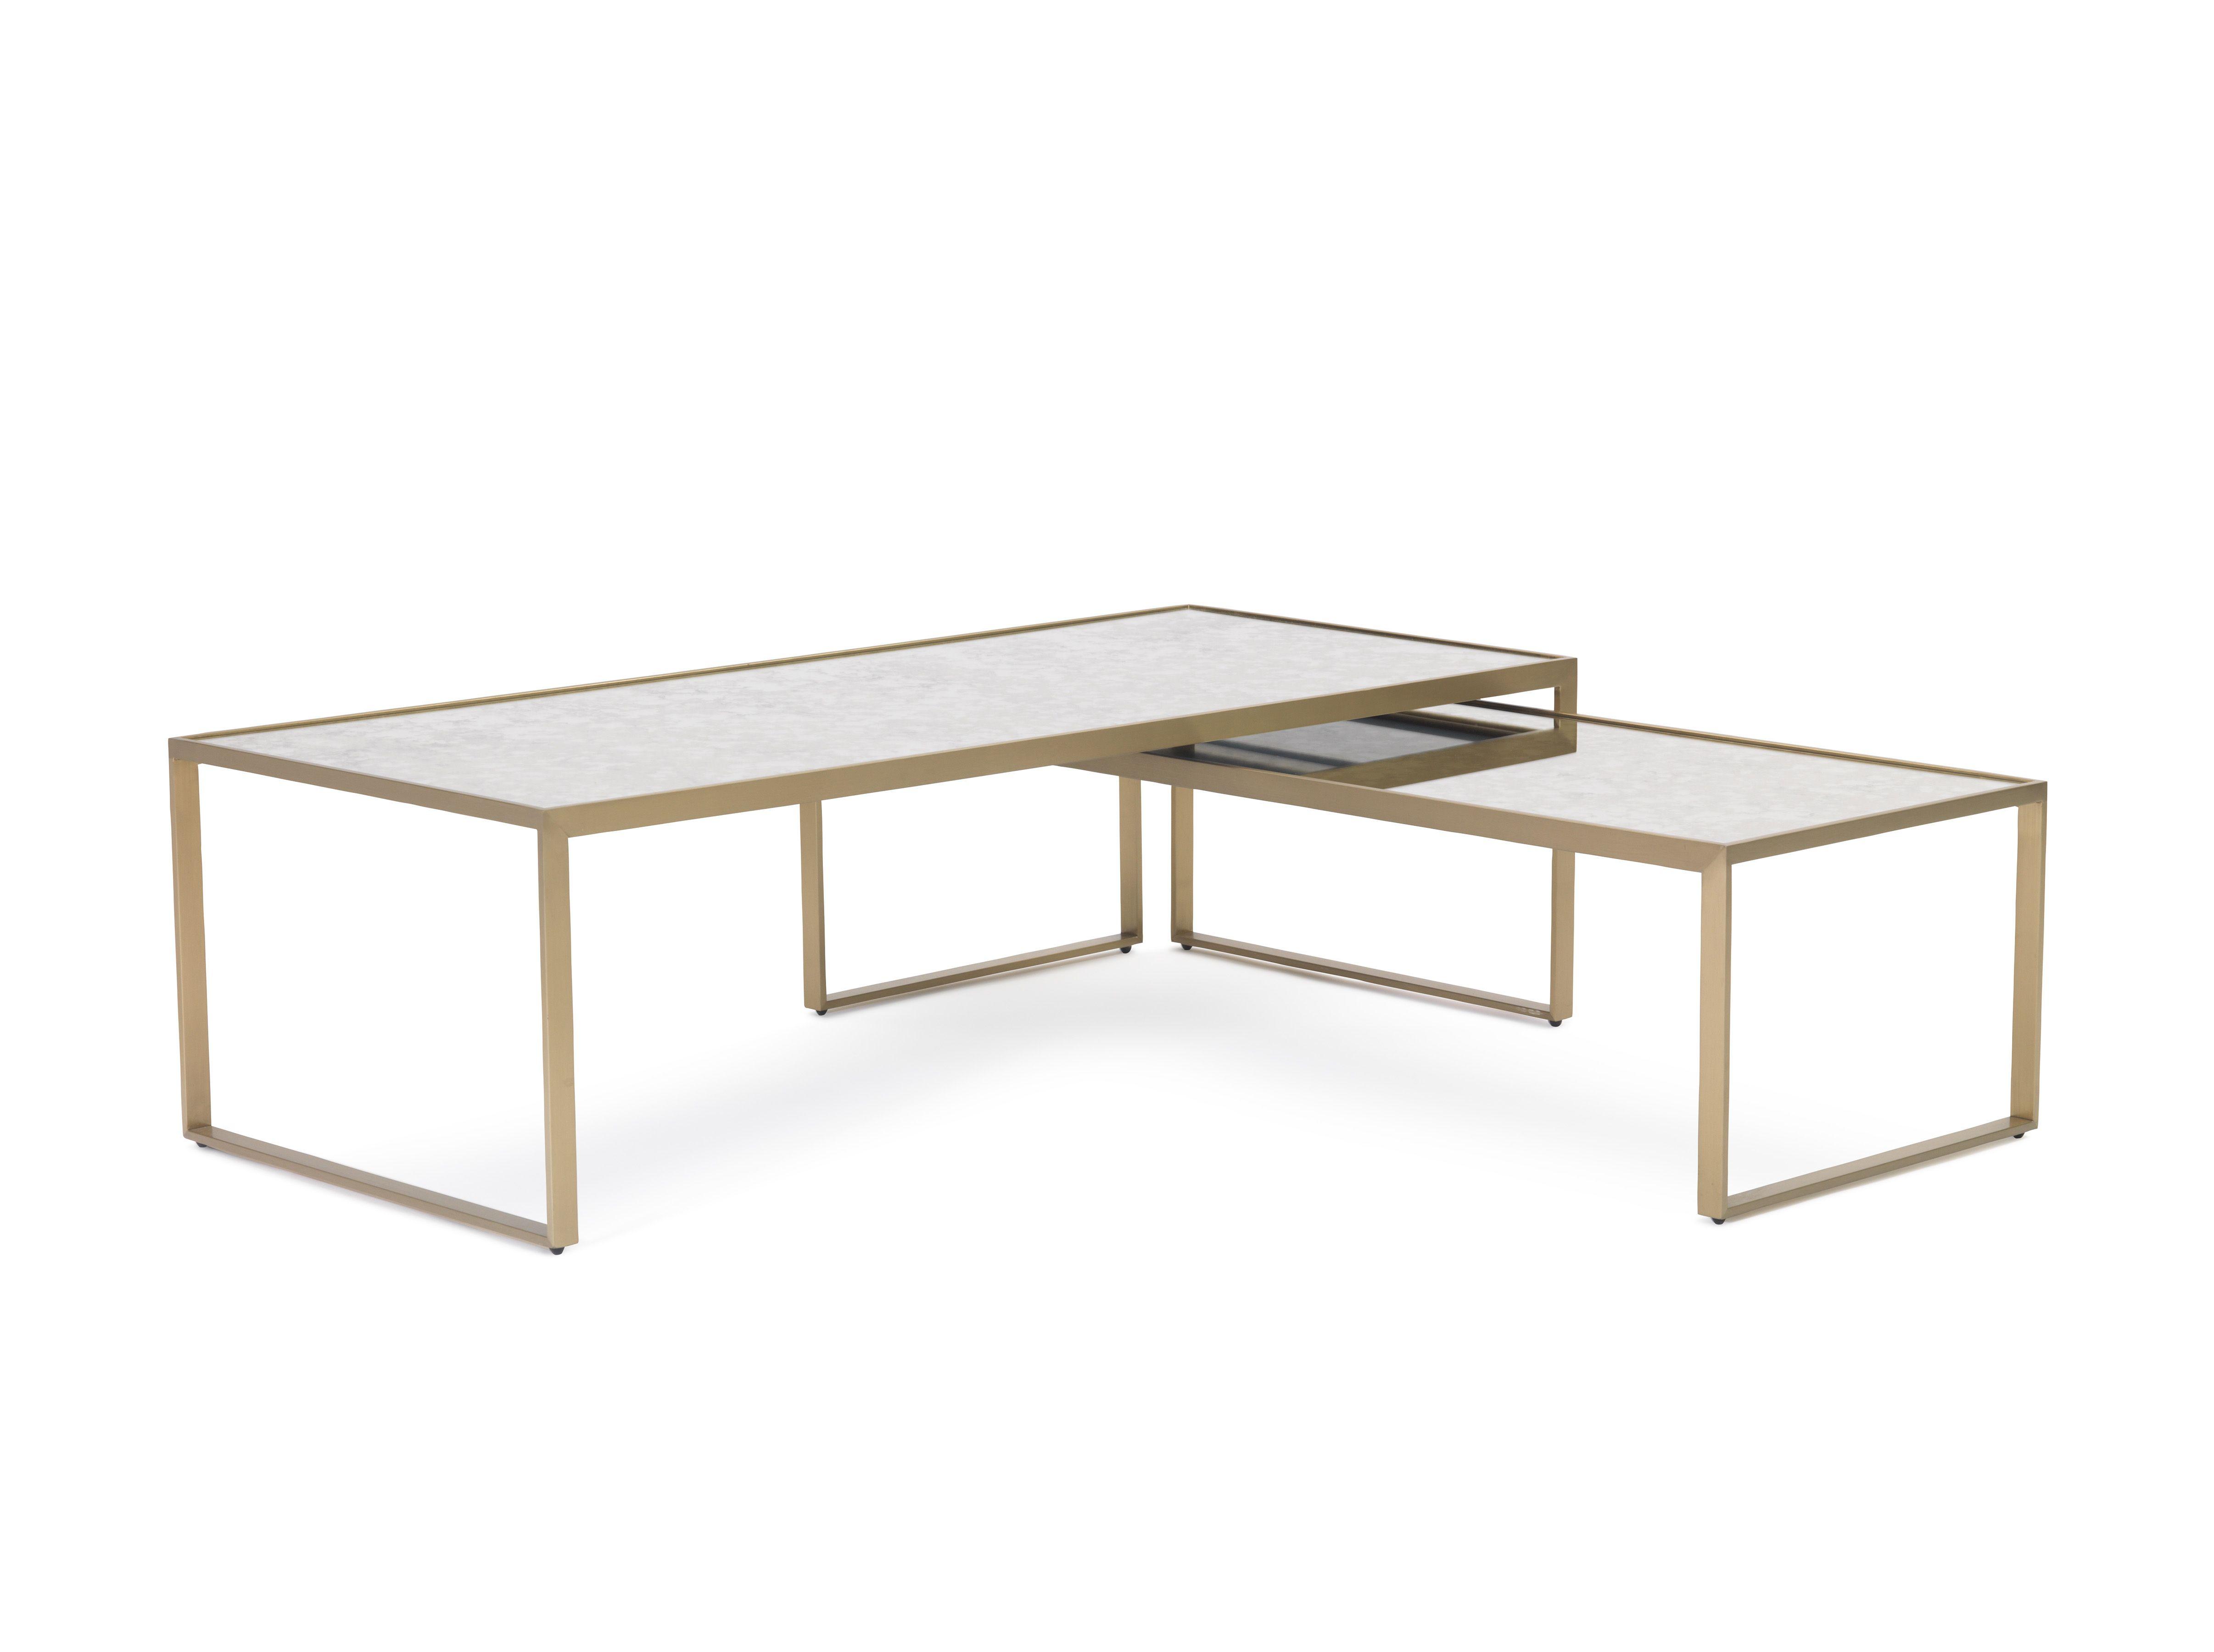 Mitchell Gold Bob Williams Montréal Astor nesting coffee table